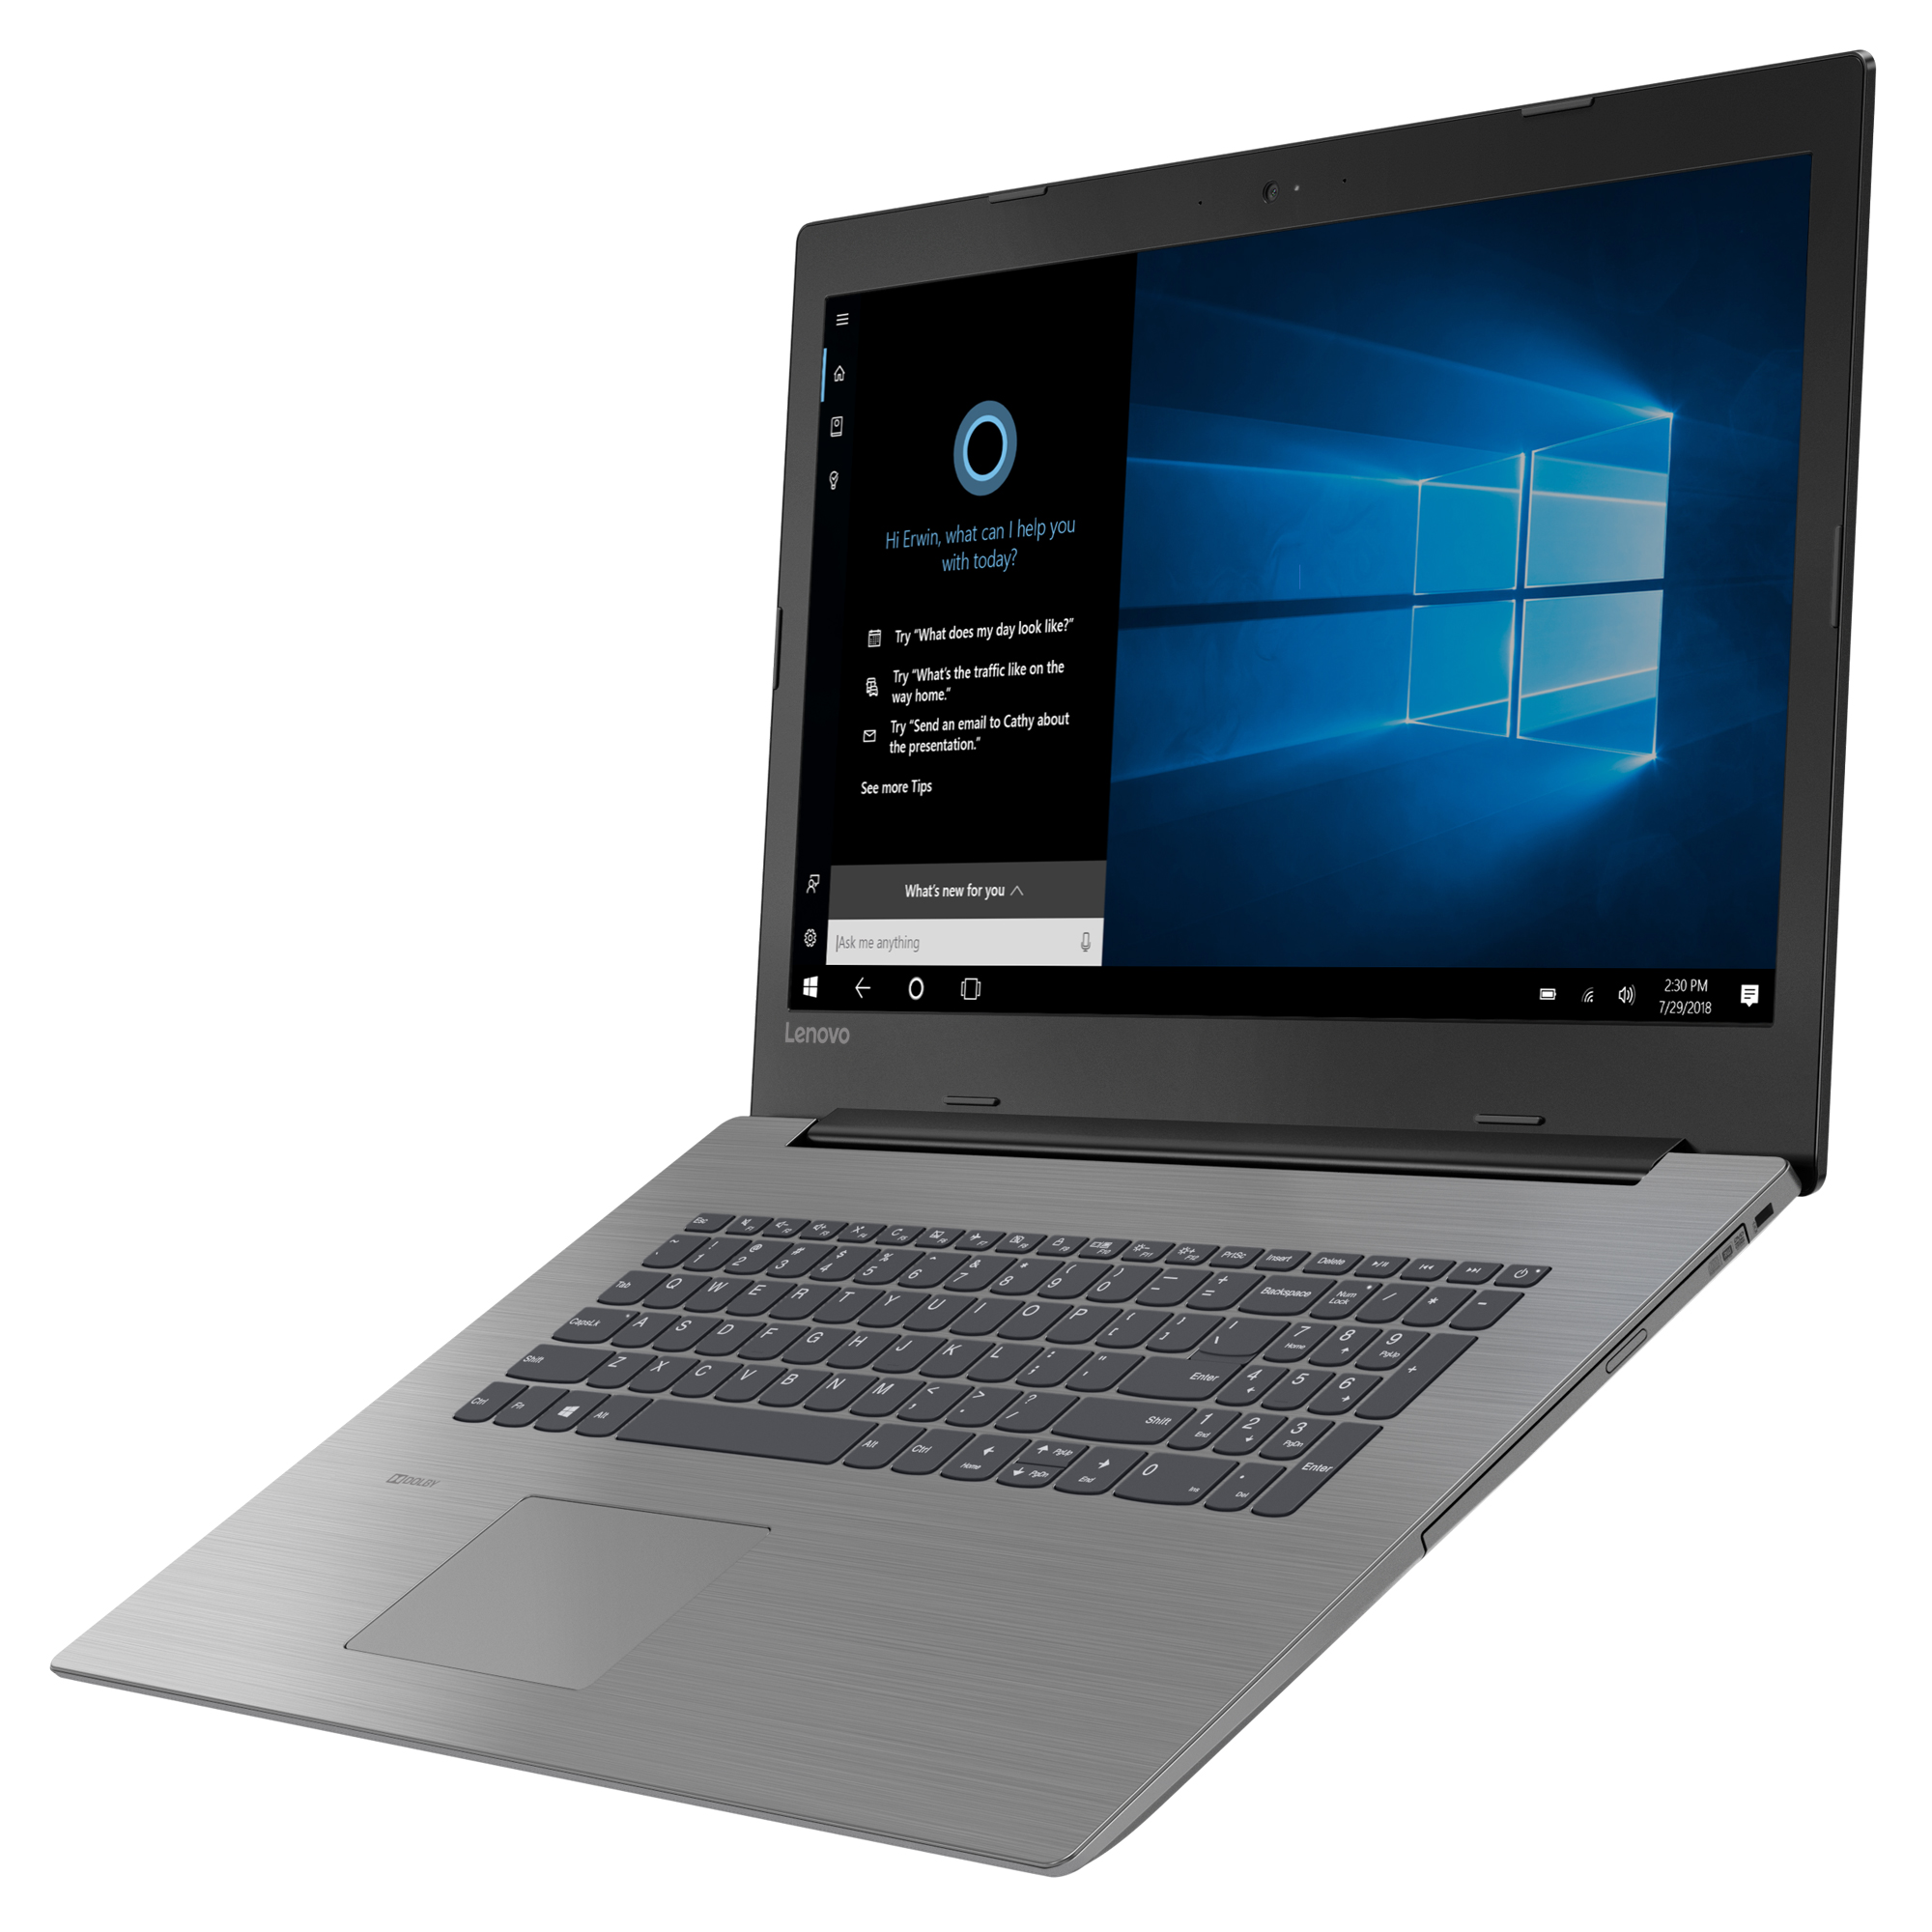 Фото  Ноутбук Lenovo ideapad 330-17IKBR Onyx Black (81DM00ENRA)